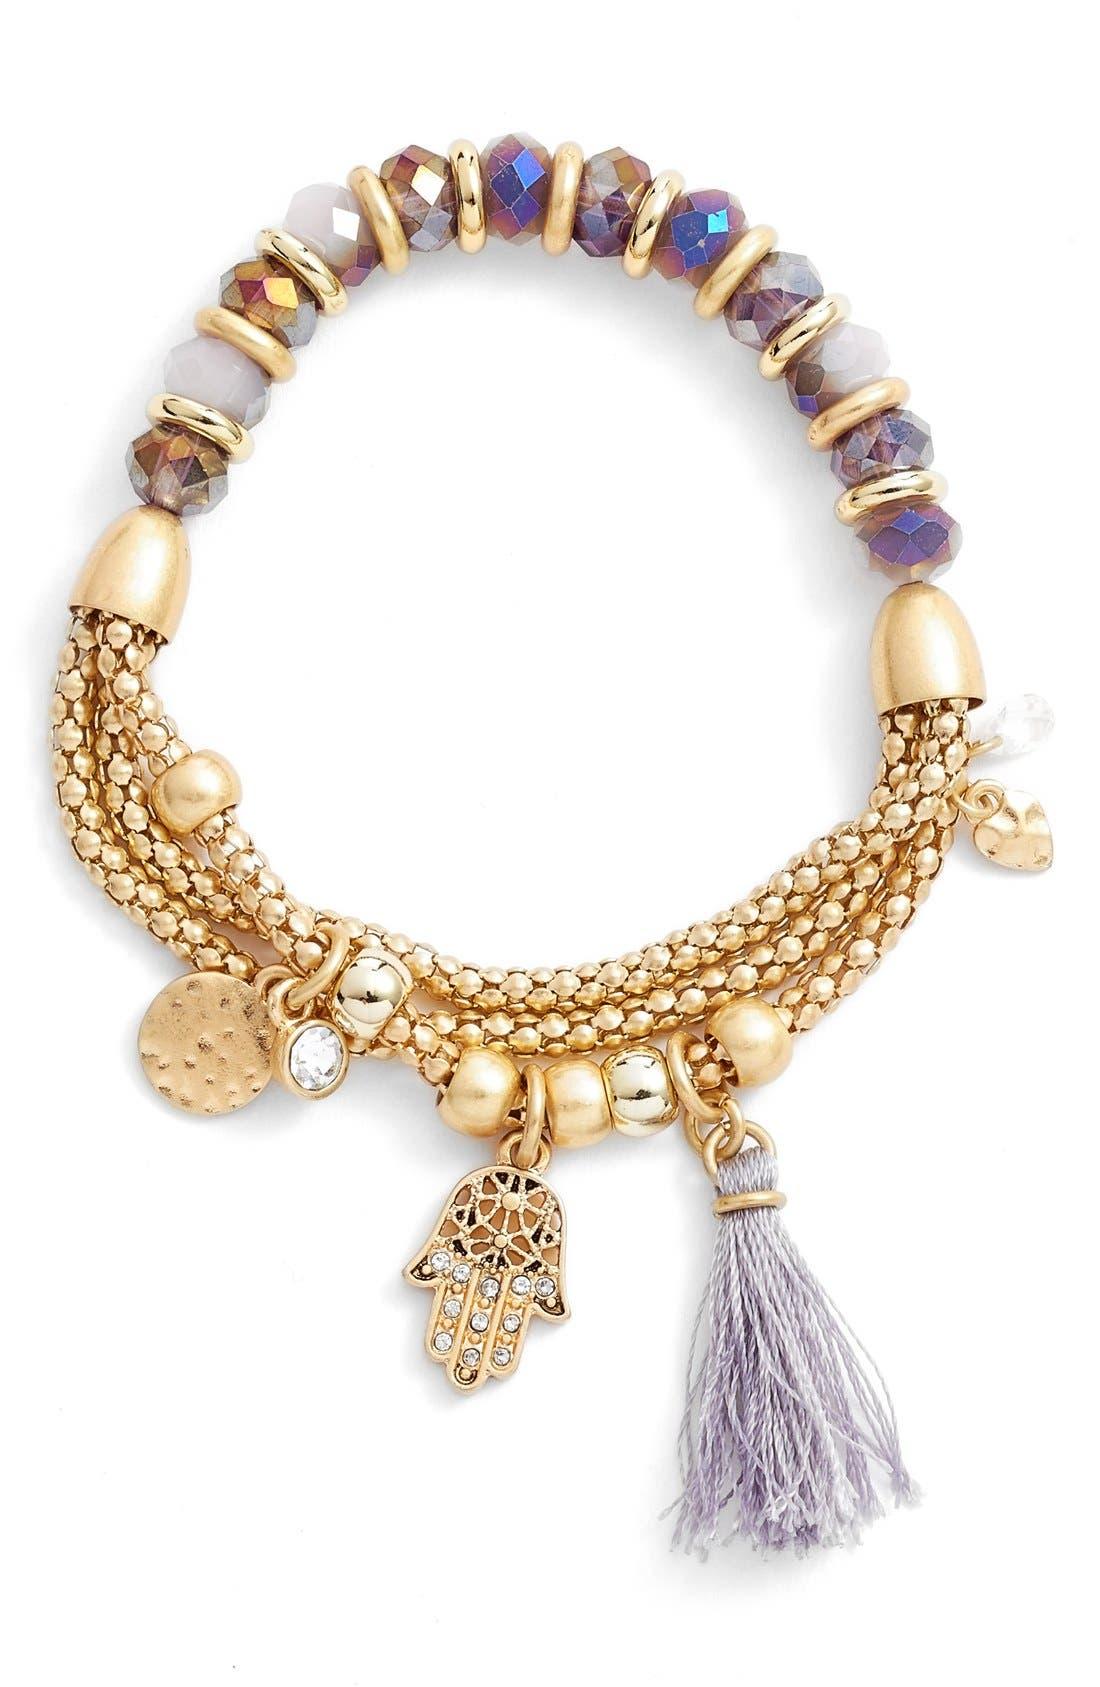 Alternate Image 1 Selected - Lonna & Lilly Beaded Stretch Bracelet